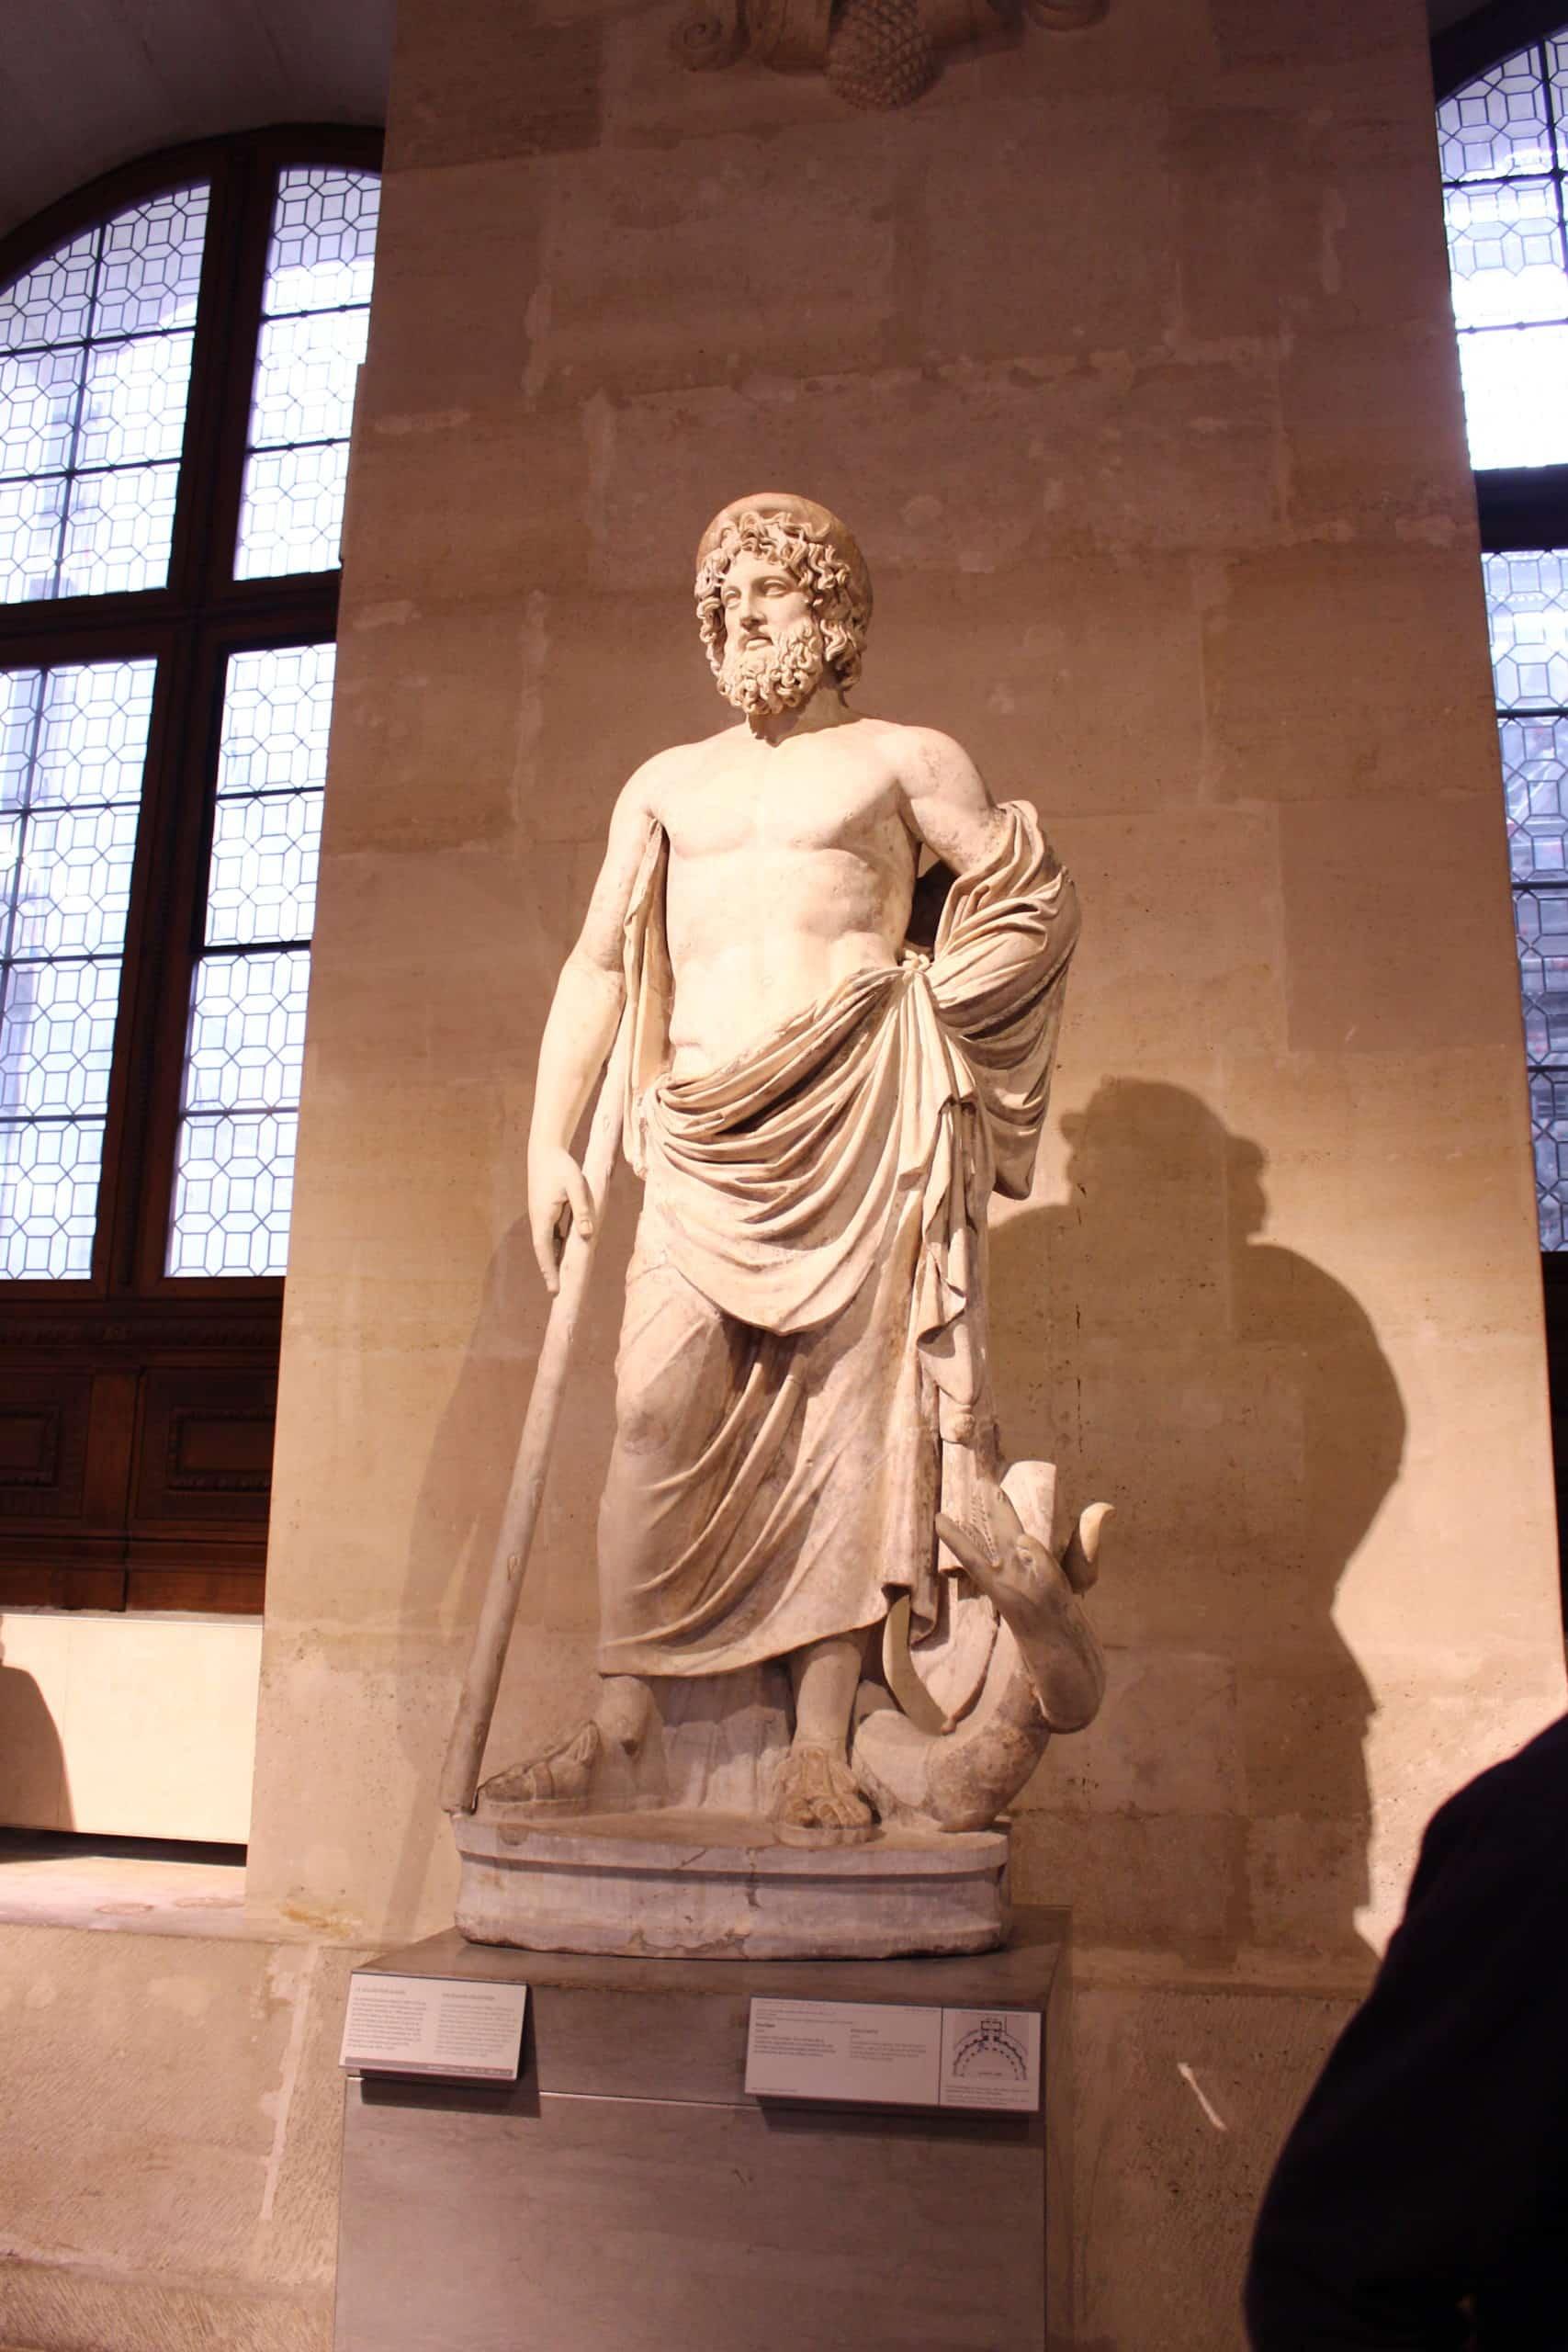 Sculpture 2 - Louvre